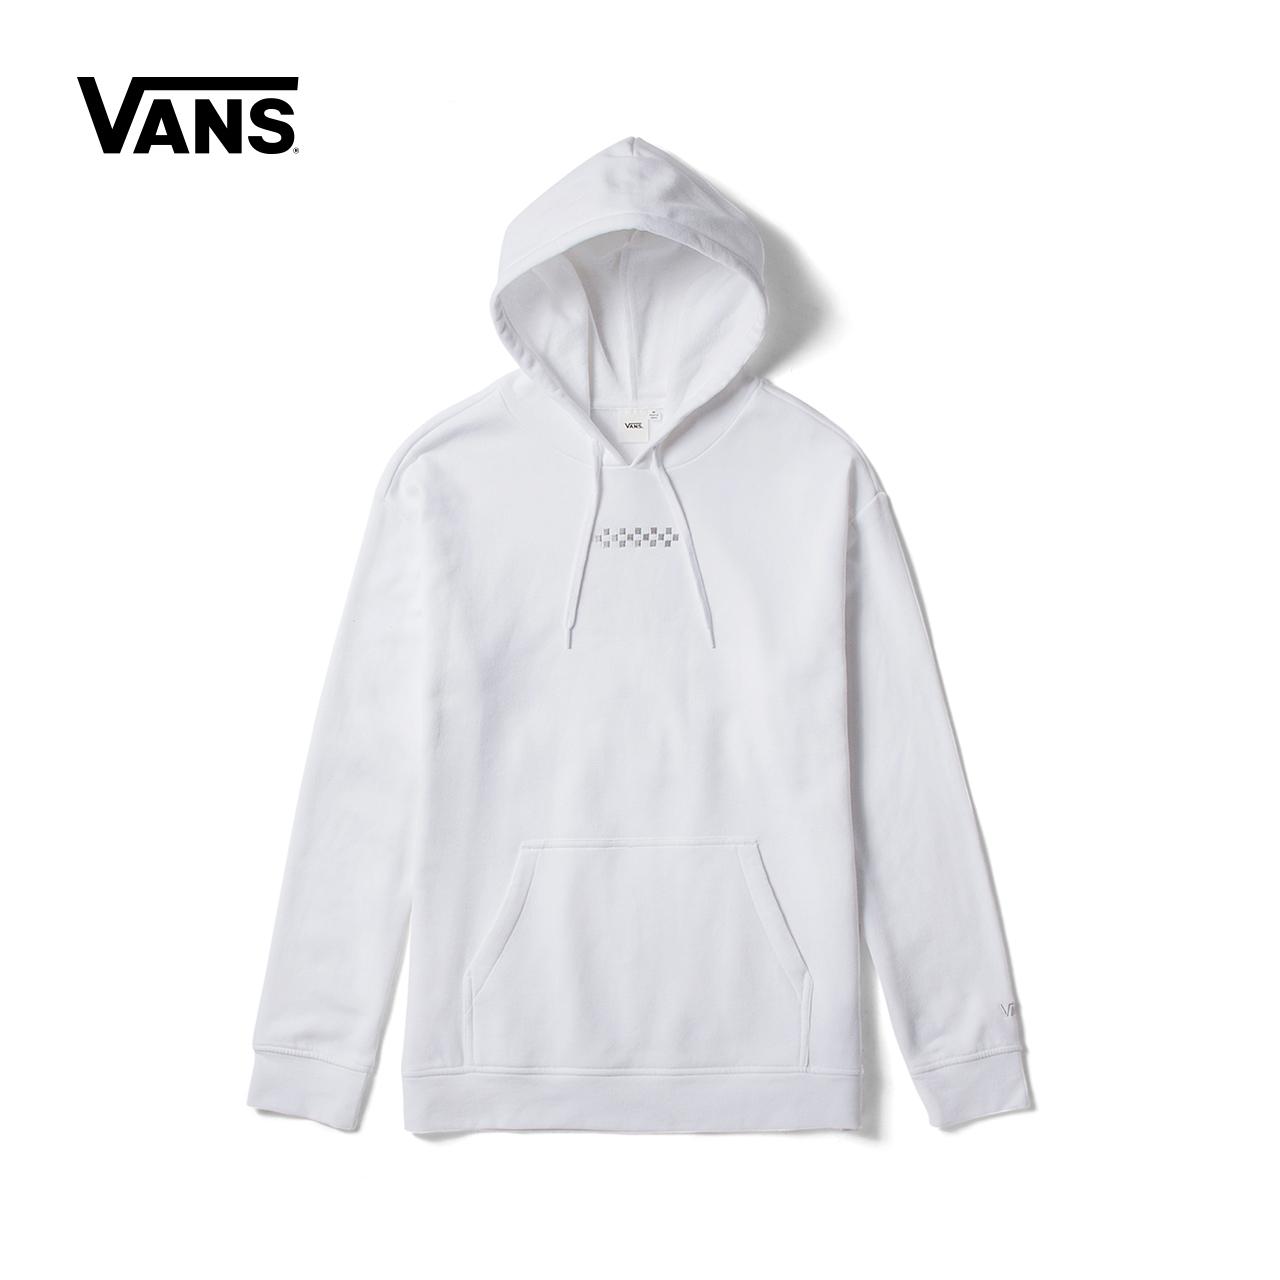 Vans 范斯官方秋季男女款加绒连帽卫衣|VN0A3PBDWHT-BLK-YDU-YDW